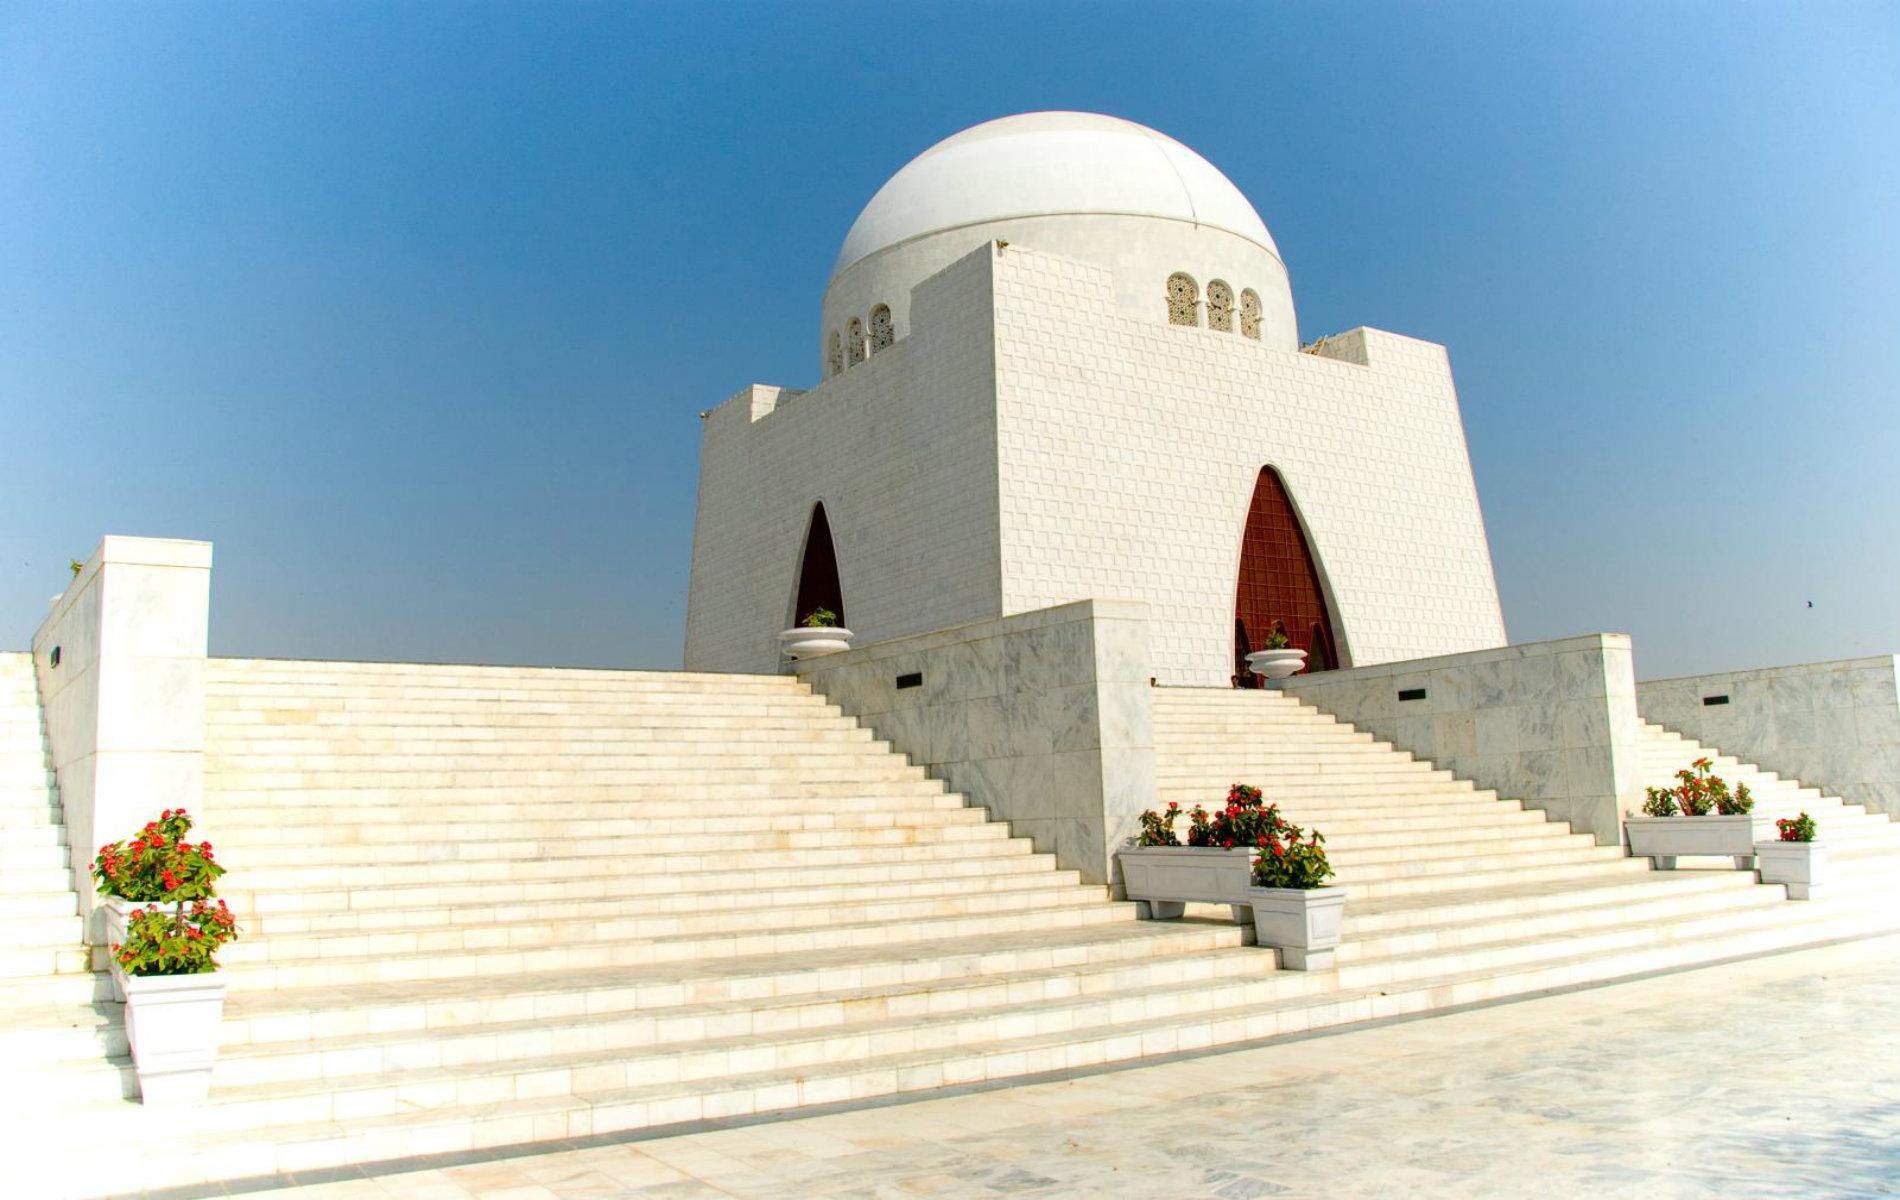 Mazar-e-Quaid-Azam- Karachi